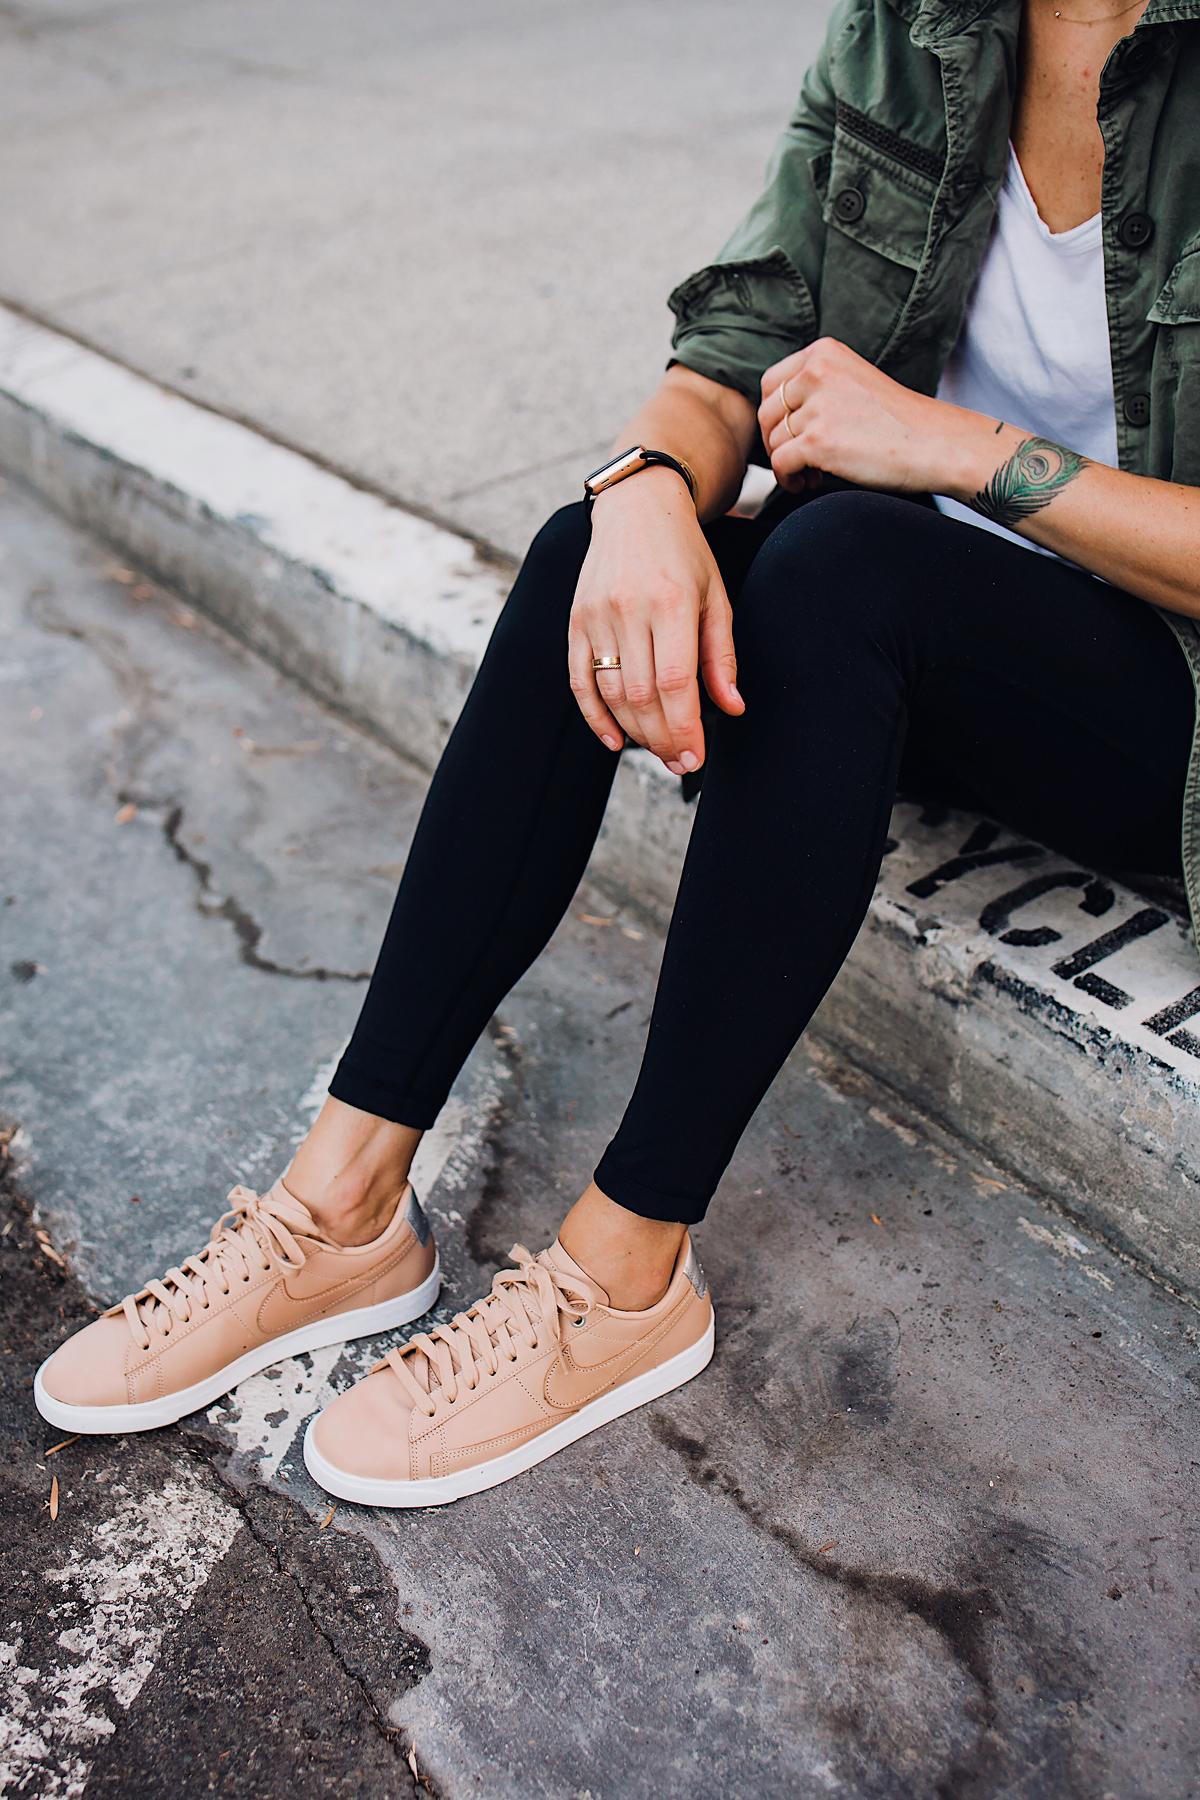 Woman Wearing Nordstrom Nike Blazer Low Top Sneaker Beige Black Leggings Green Utility Jacket White Tshirt Fashion Jackson San Diego Fashion Blogger Street Style